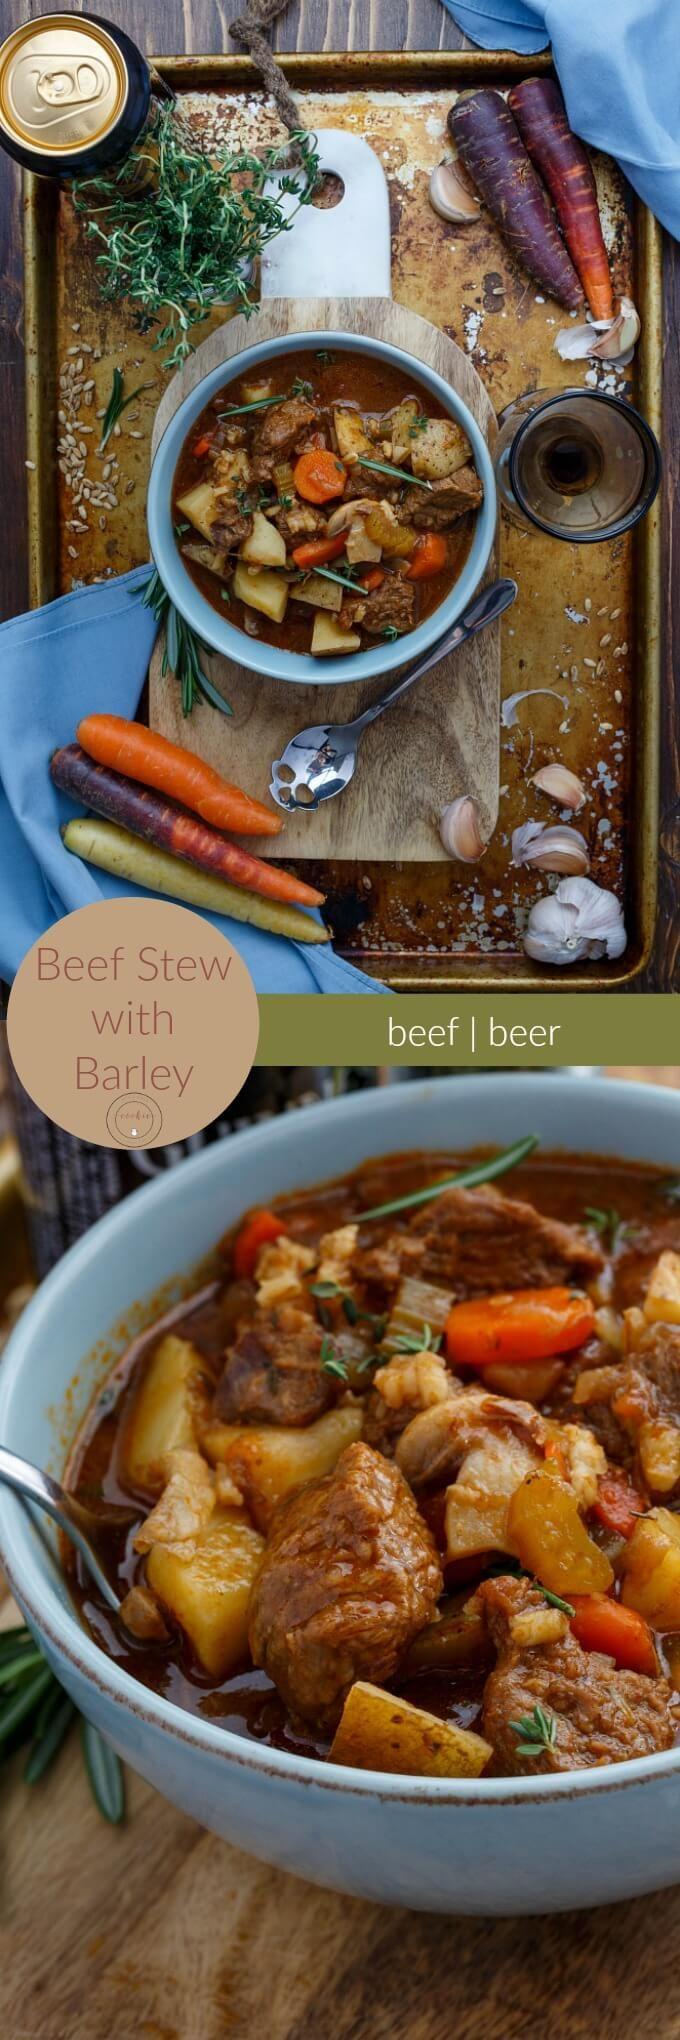 Beef Stew with Barley | http://thecookiewriter.com | #stew #beef #beer #dinner #glutenfree (omit barley)